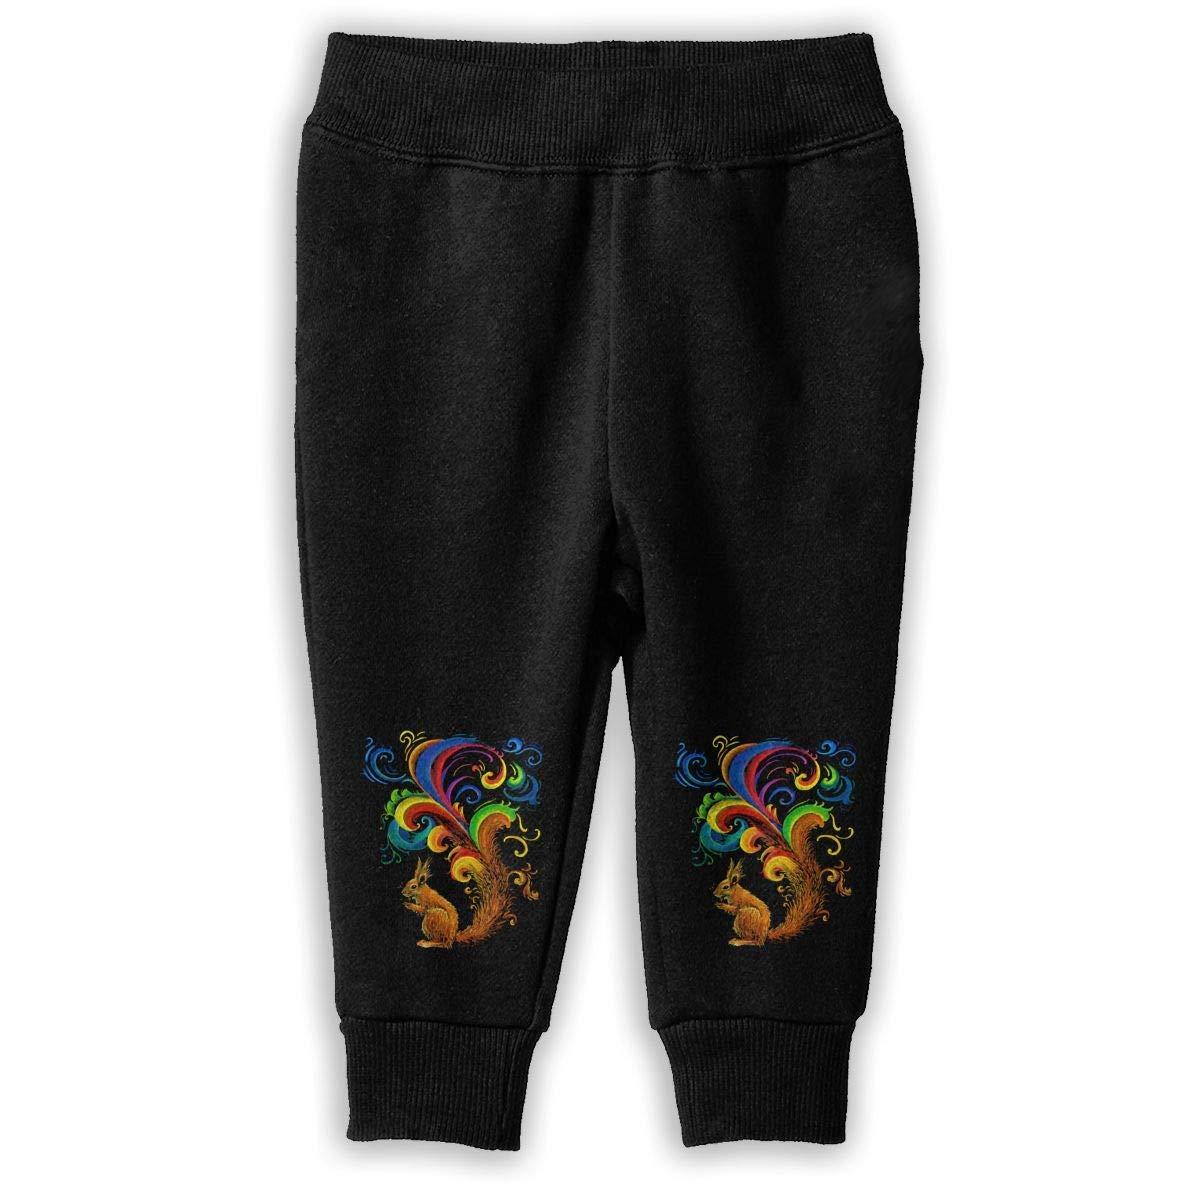 ShineFun Printed Psychedelic Squirrel Child Boys Girls Unisex Fashion Sweatpants